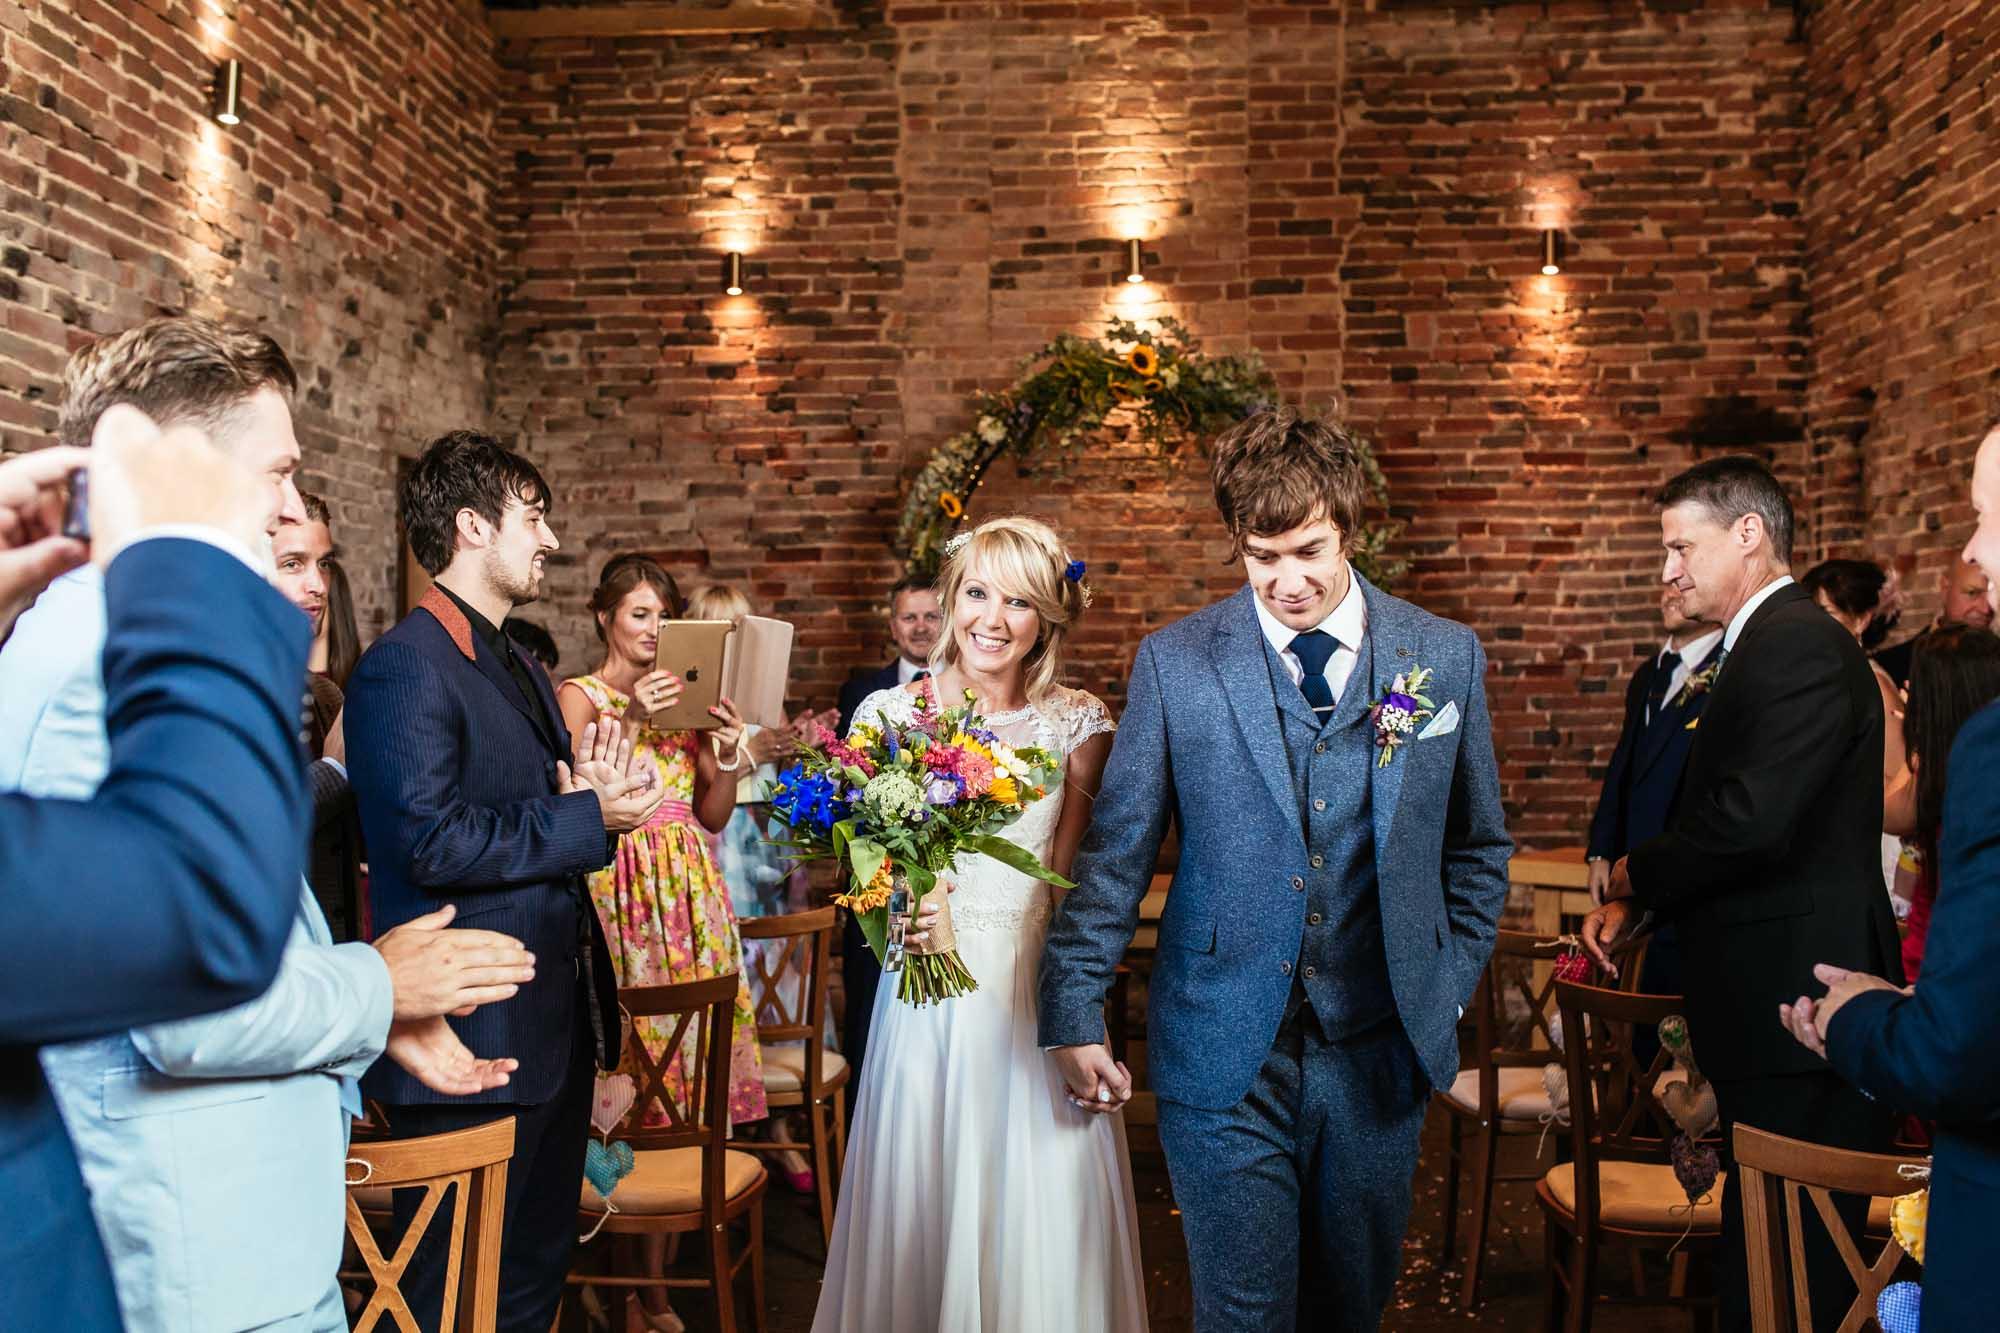 Colourful Vintage Barn Wedding Ceremony